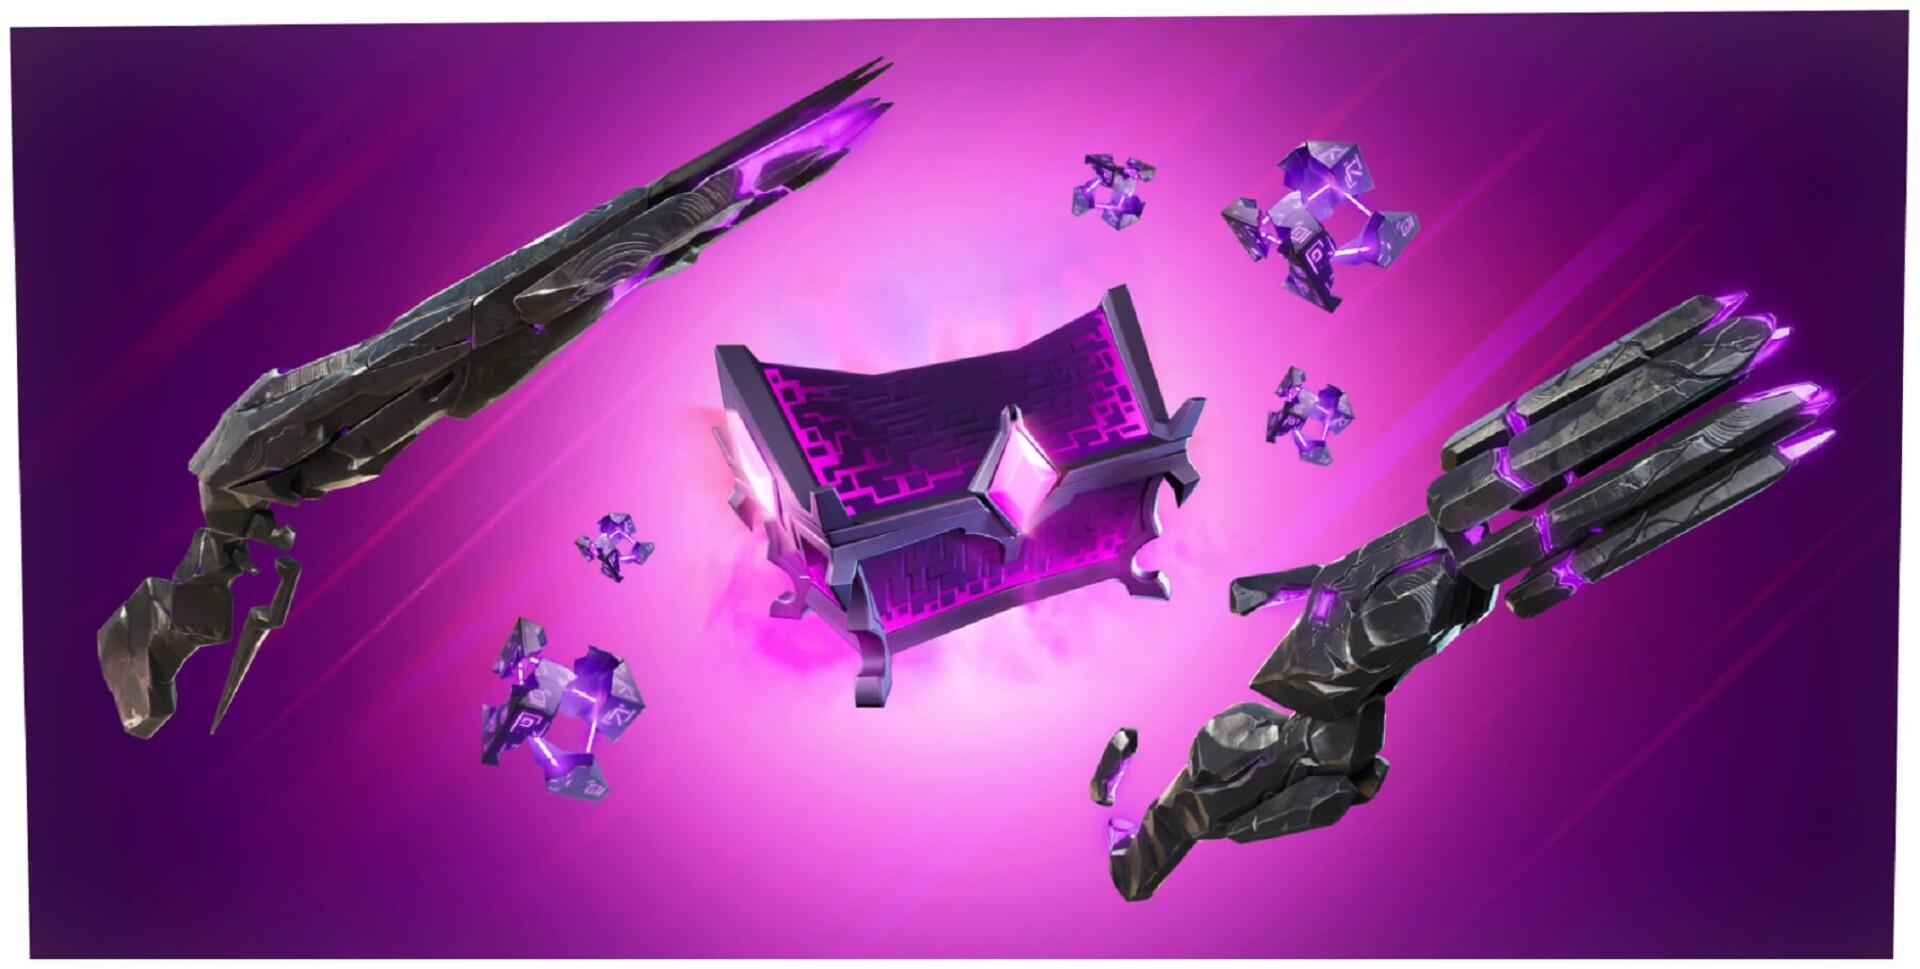 Fortnite Season 8 New Weapons